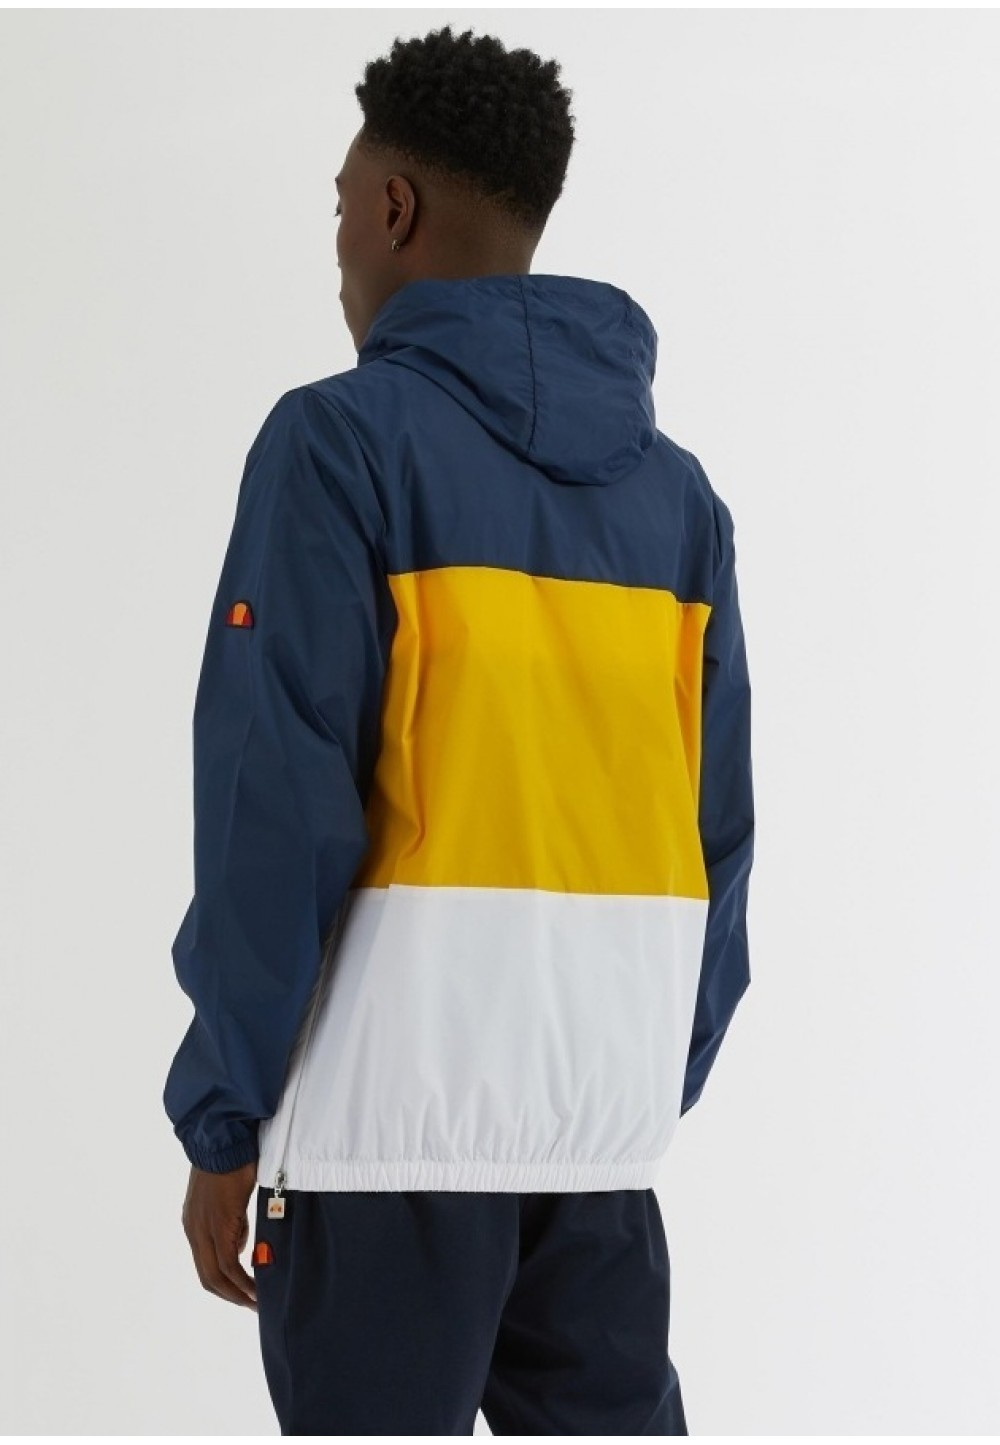 Трехцветная куртка